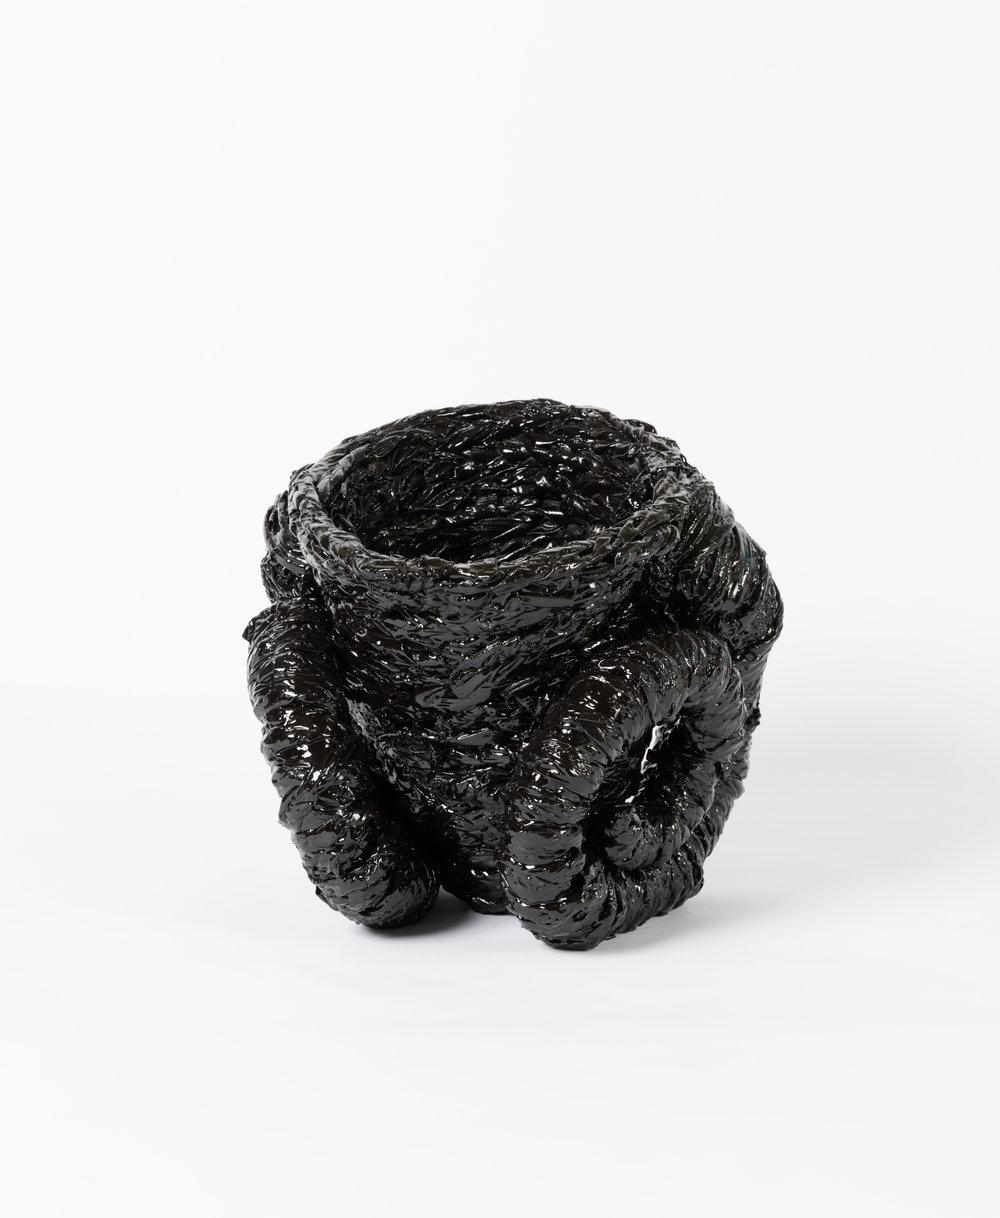 Vadis Turner,  Horned Vessel  (2018). Image by John Schweikert. Courtesy of Zeitgeist Gallery.